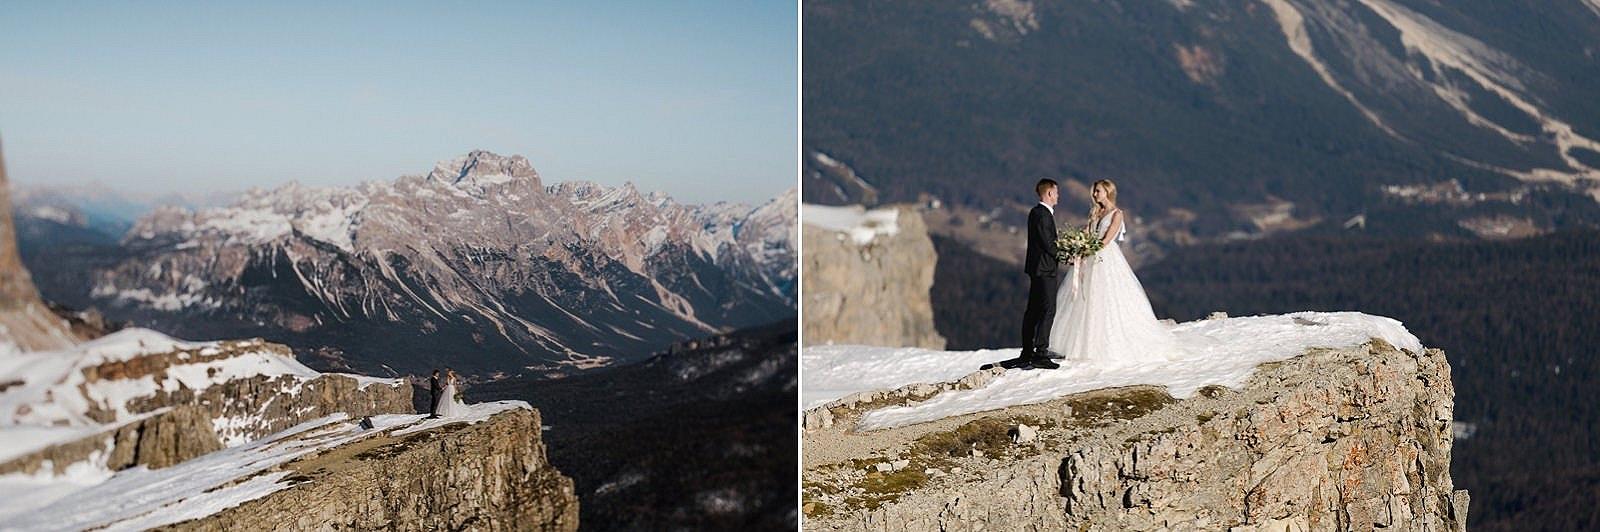 Adventurous+Dolomites+Elopement+Wedding+Fotomagoria17.jpg